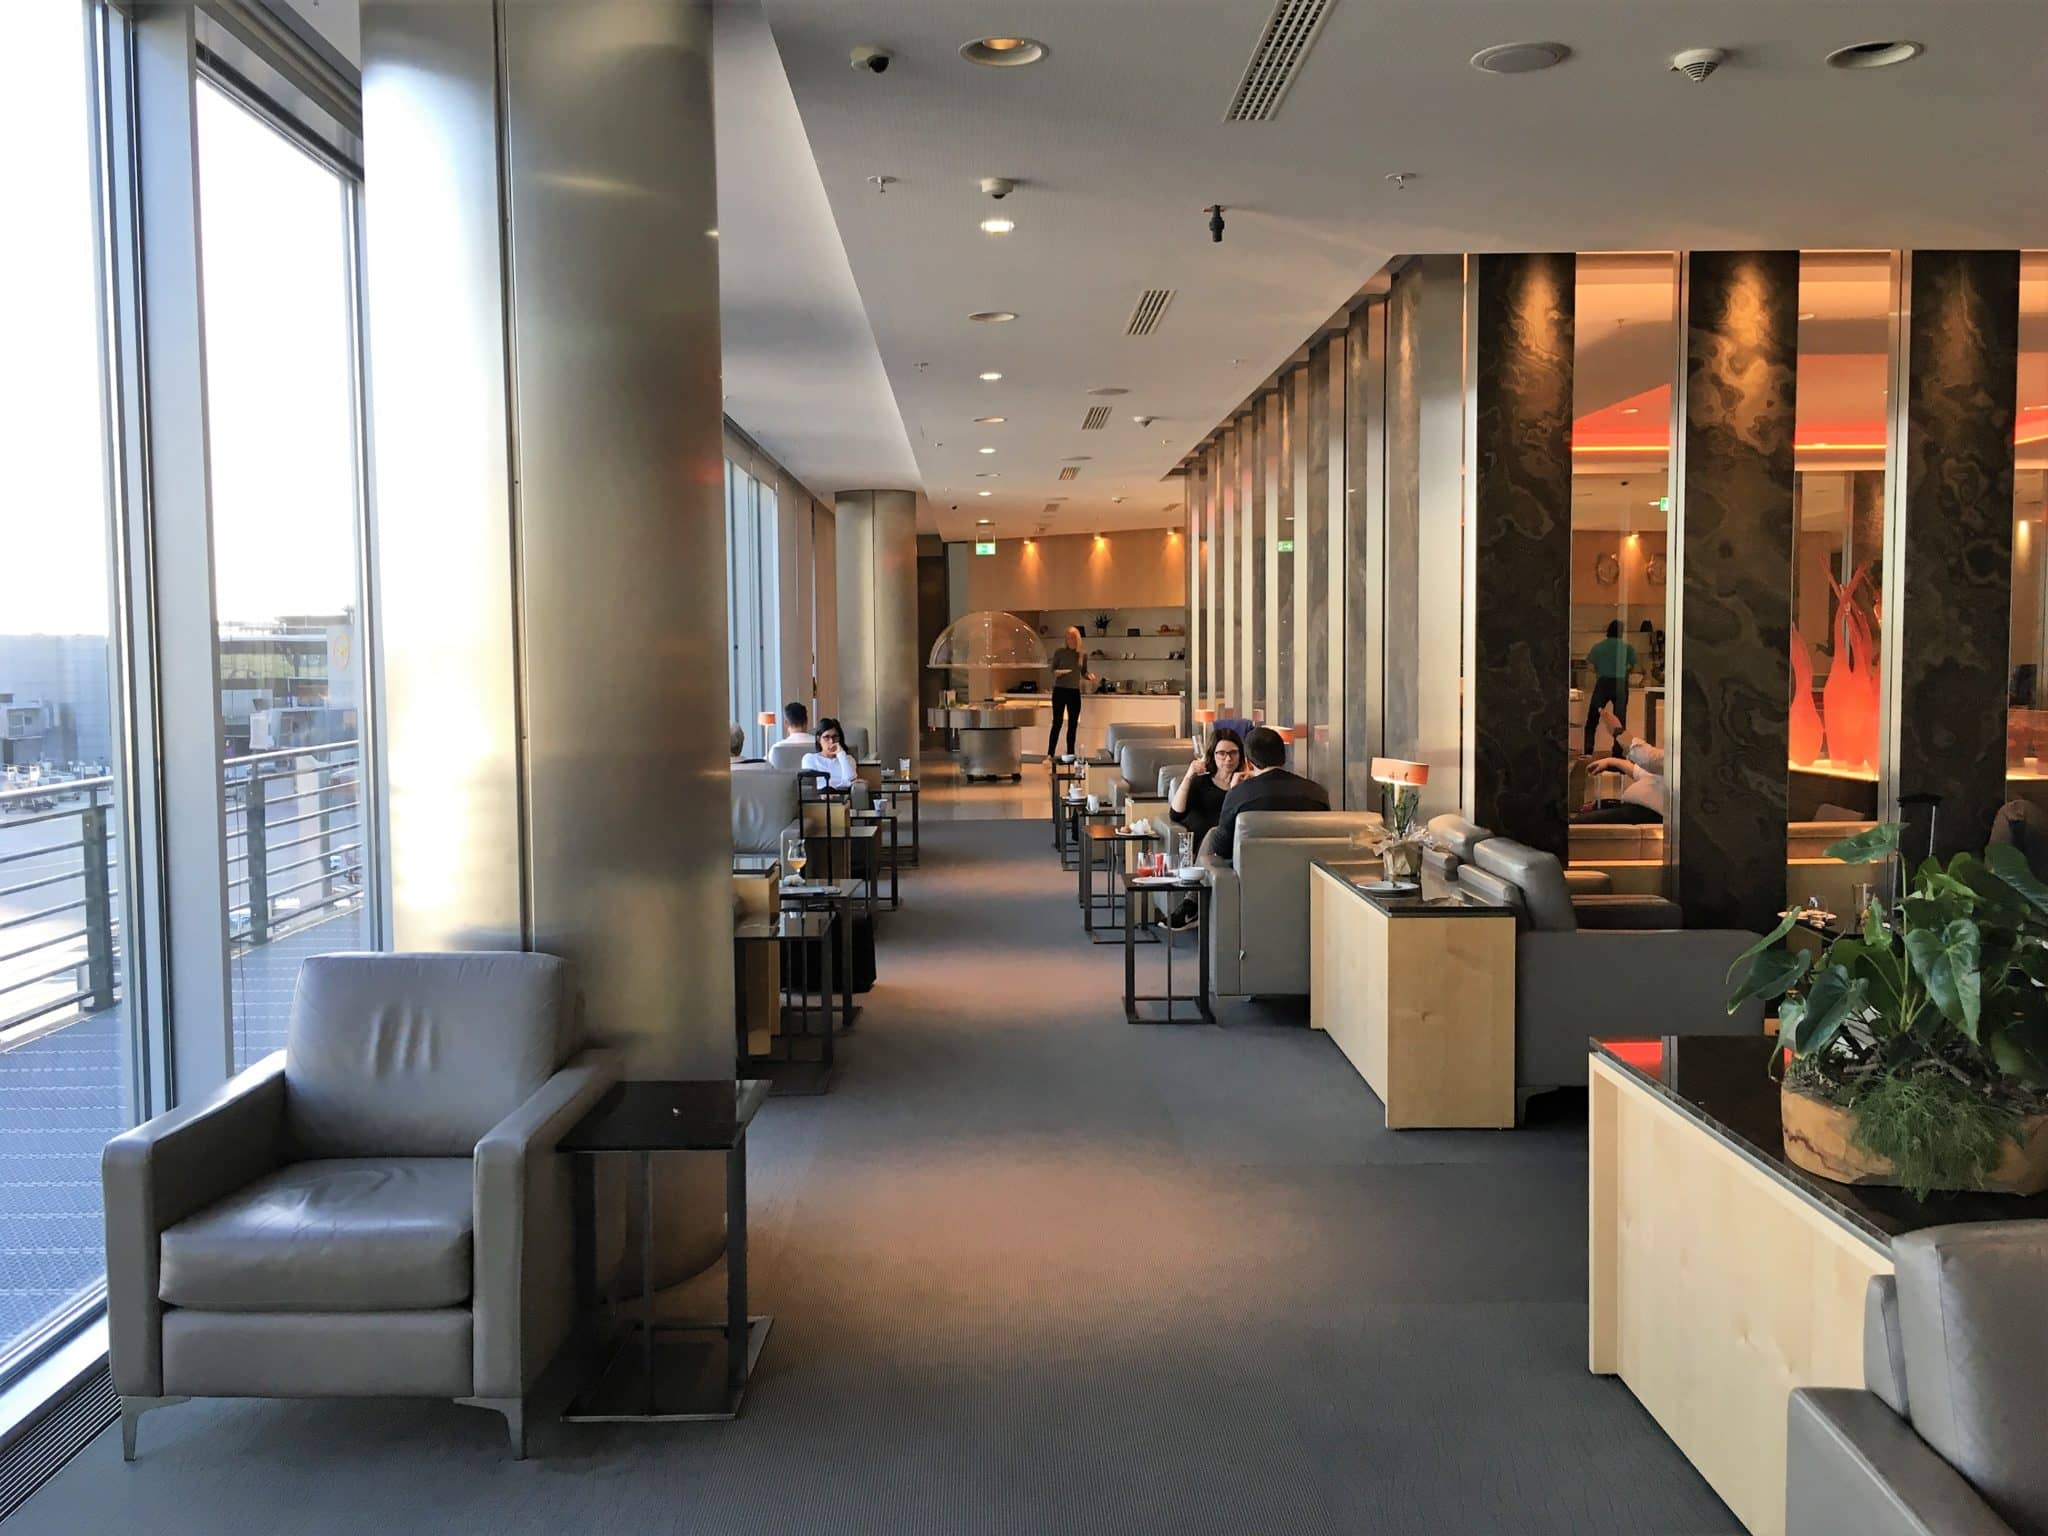 Air Canada Maple Leaf Lounge Frankfurt Fensterfront